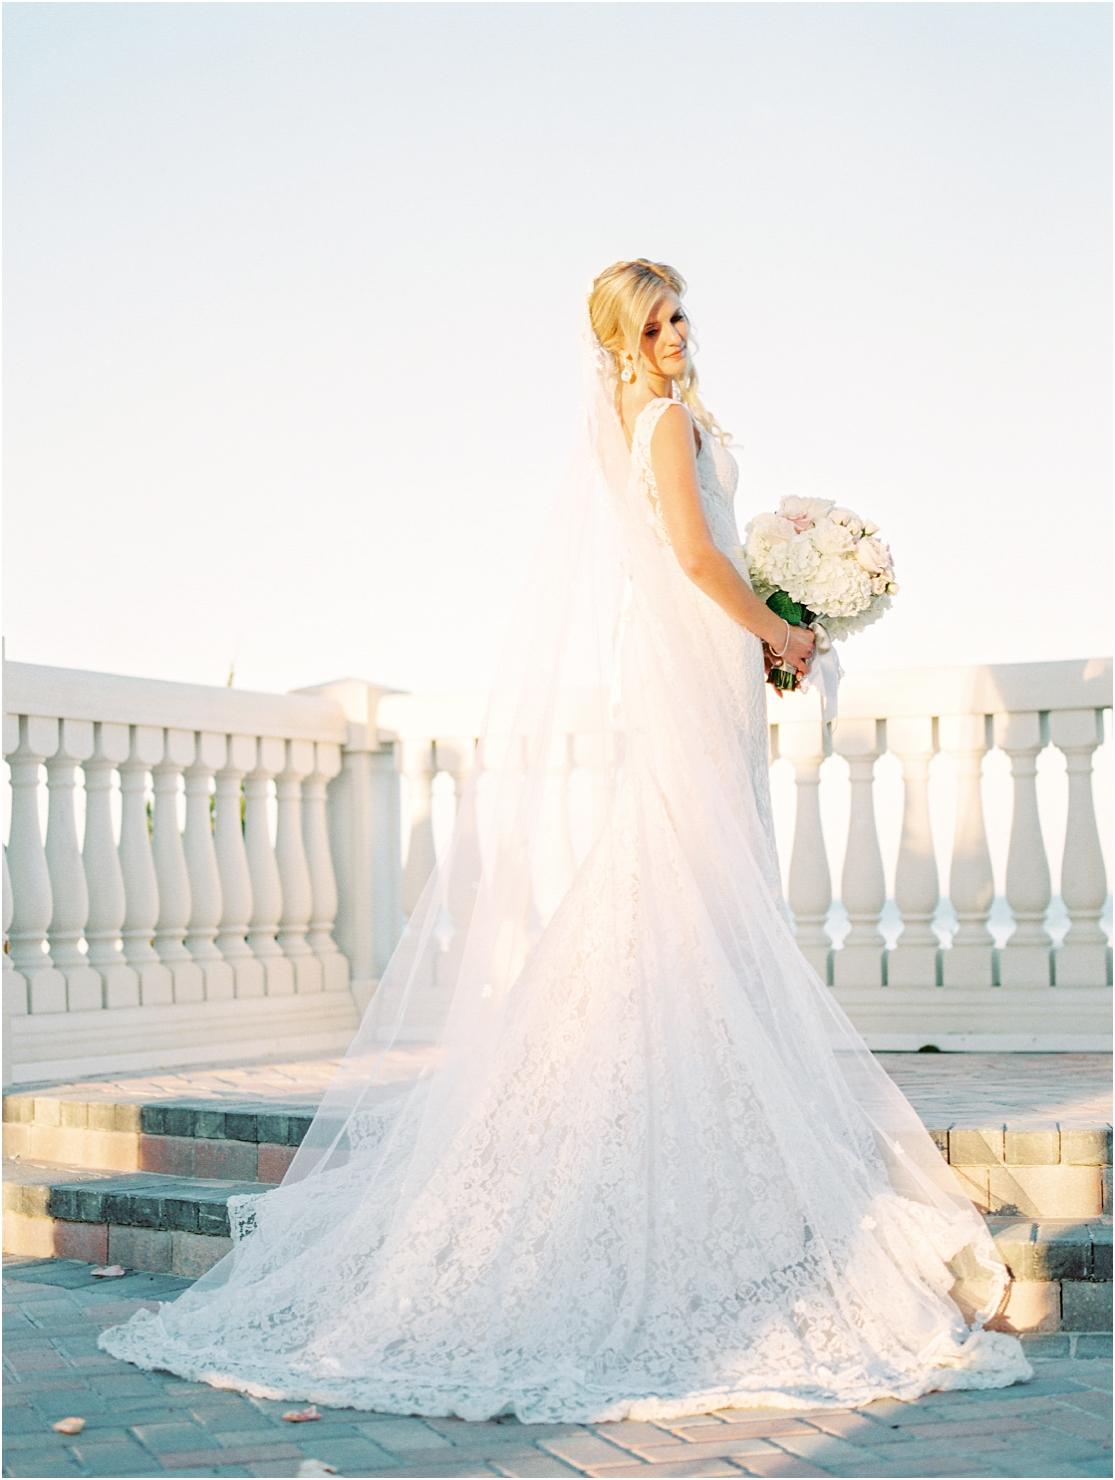 Lisa Silva Photography- Ponte Vedra Beach and Jacksonville, Florida Fine Art Film Wedding Photography- Wedding at the Ponte Vedra Inn and Club_0023.jpg